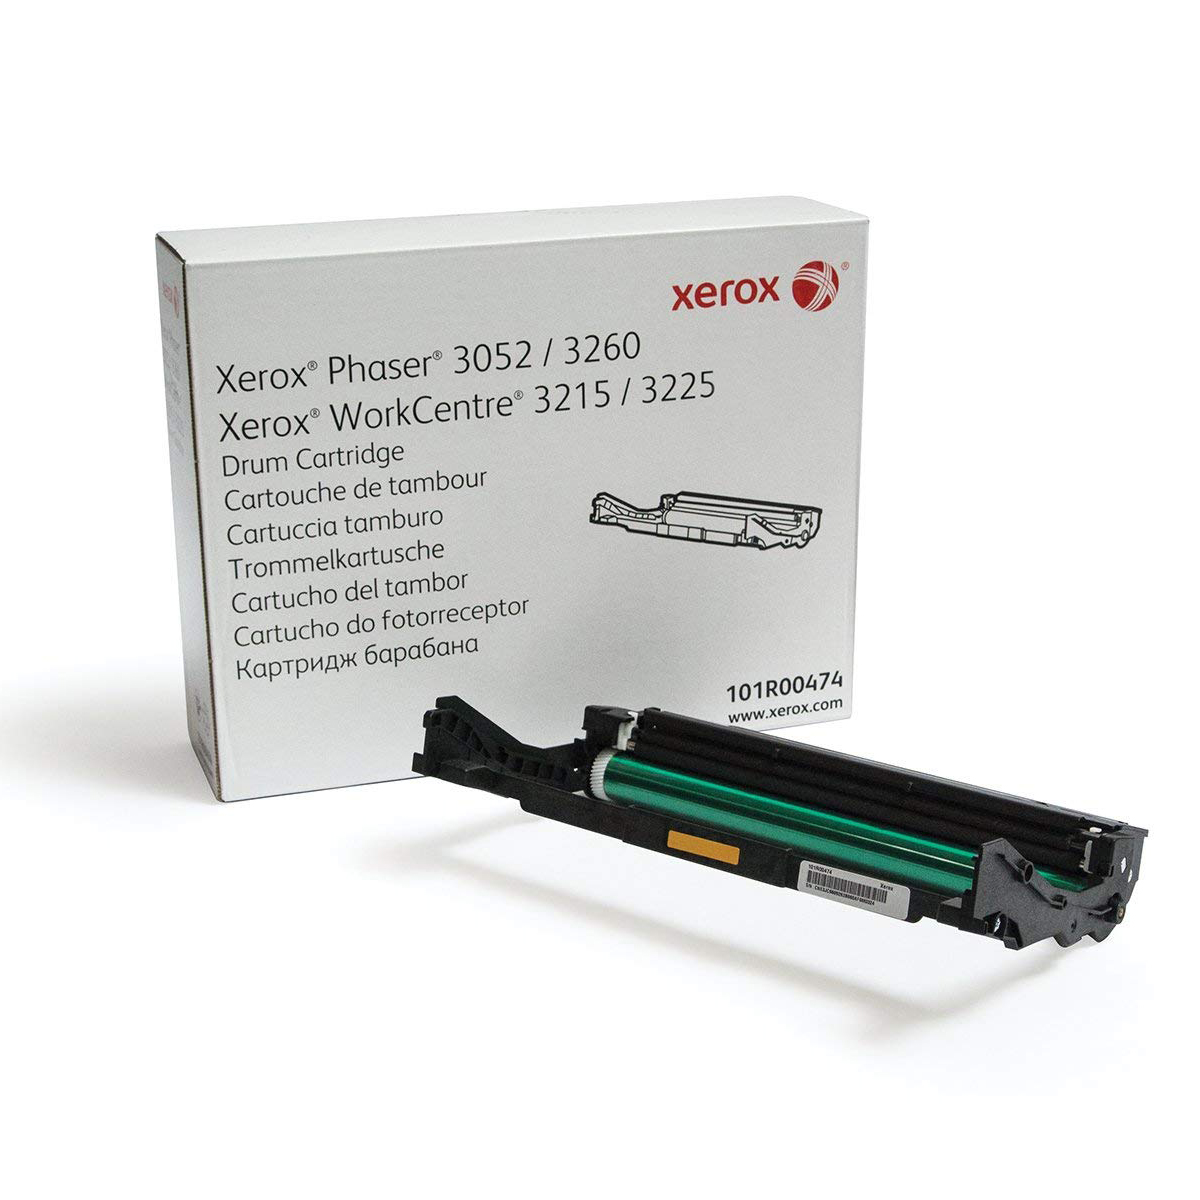 Xerox 101R00474 Drum Cartridge